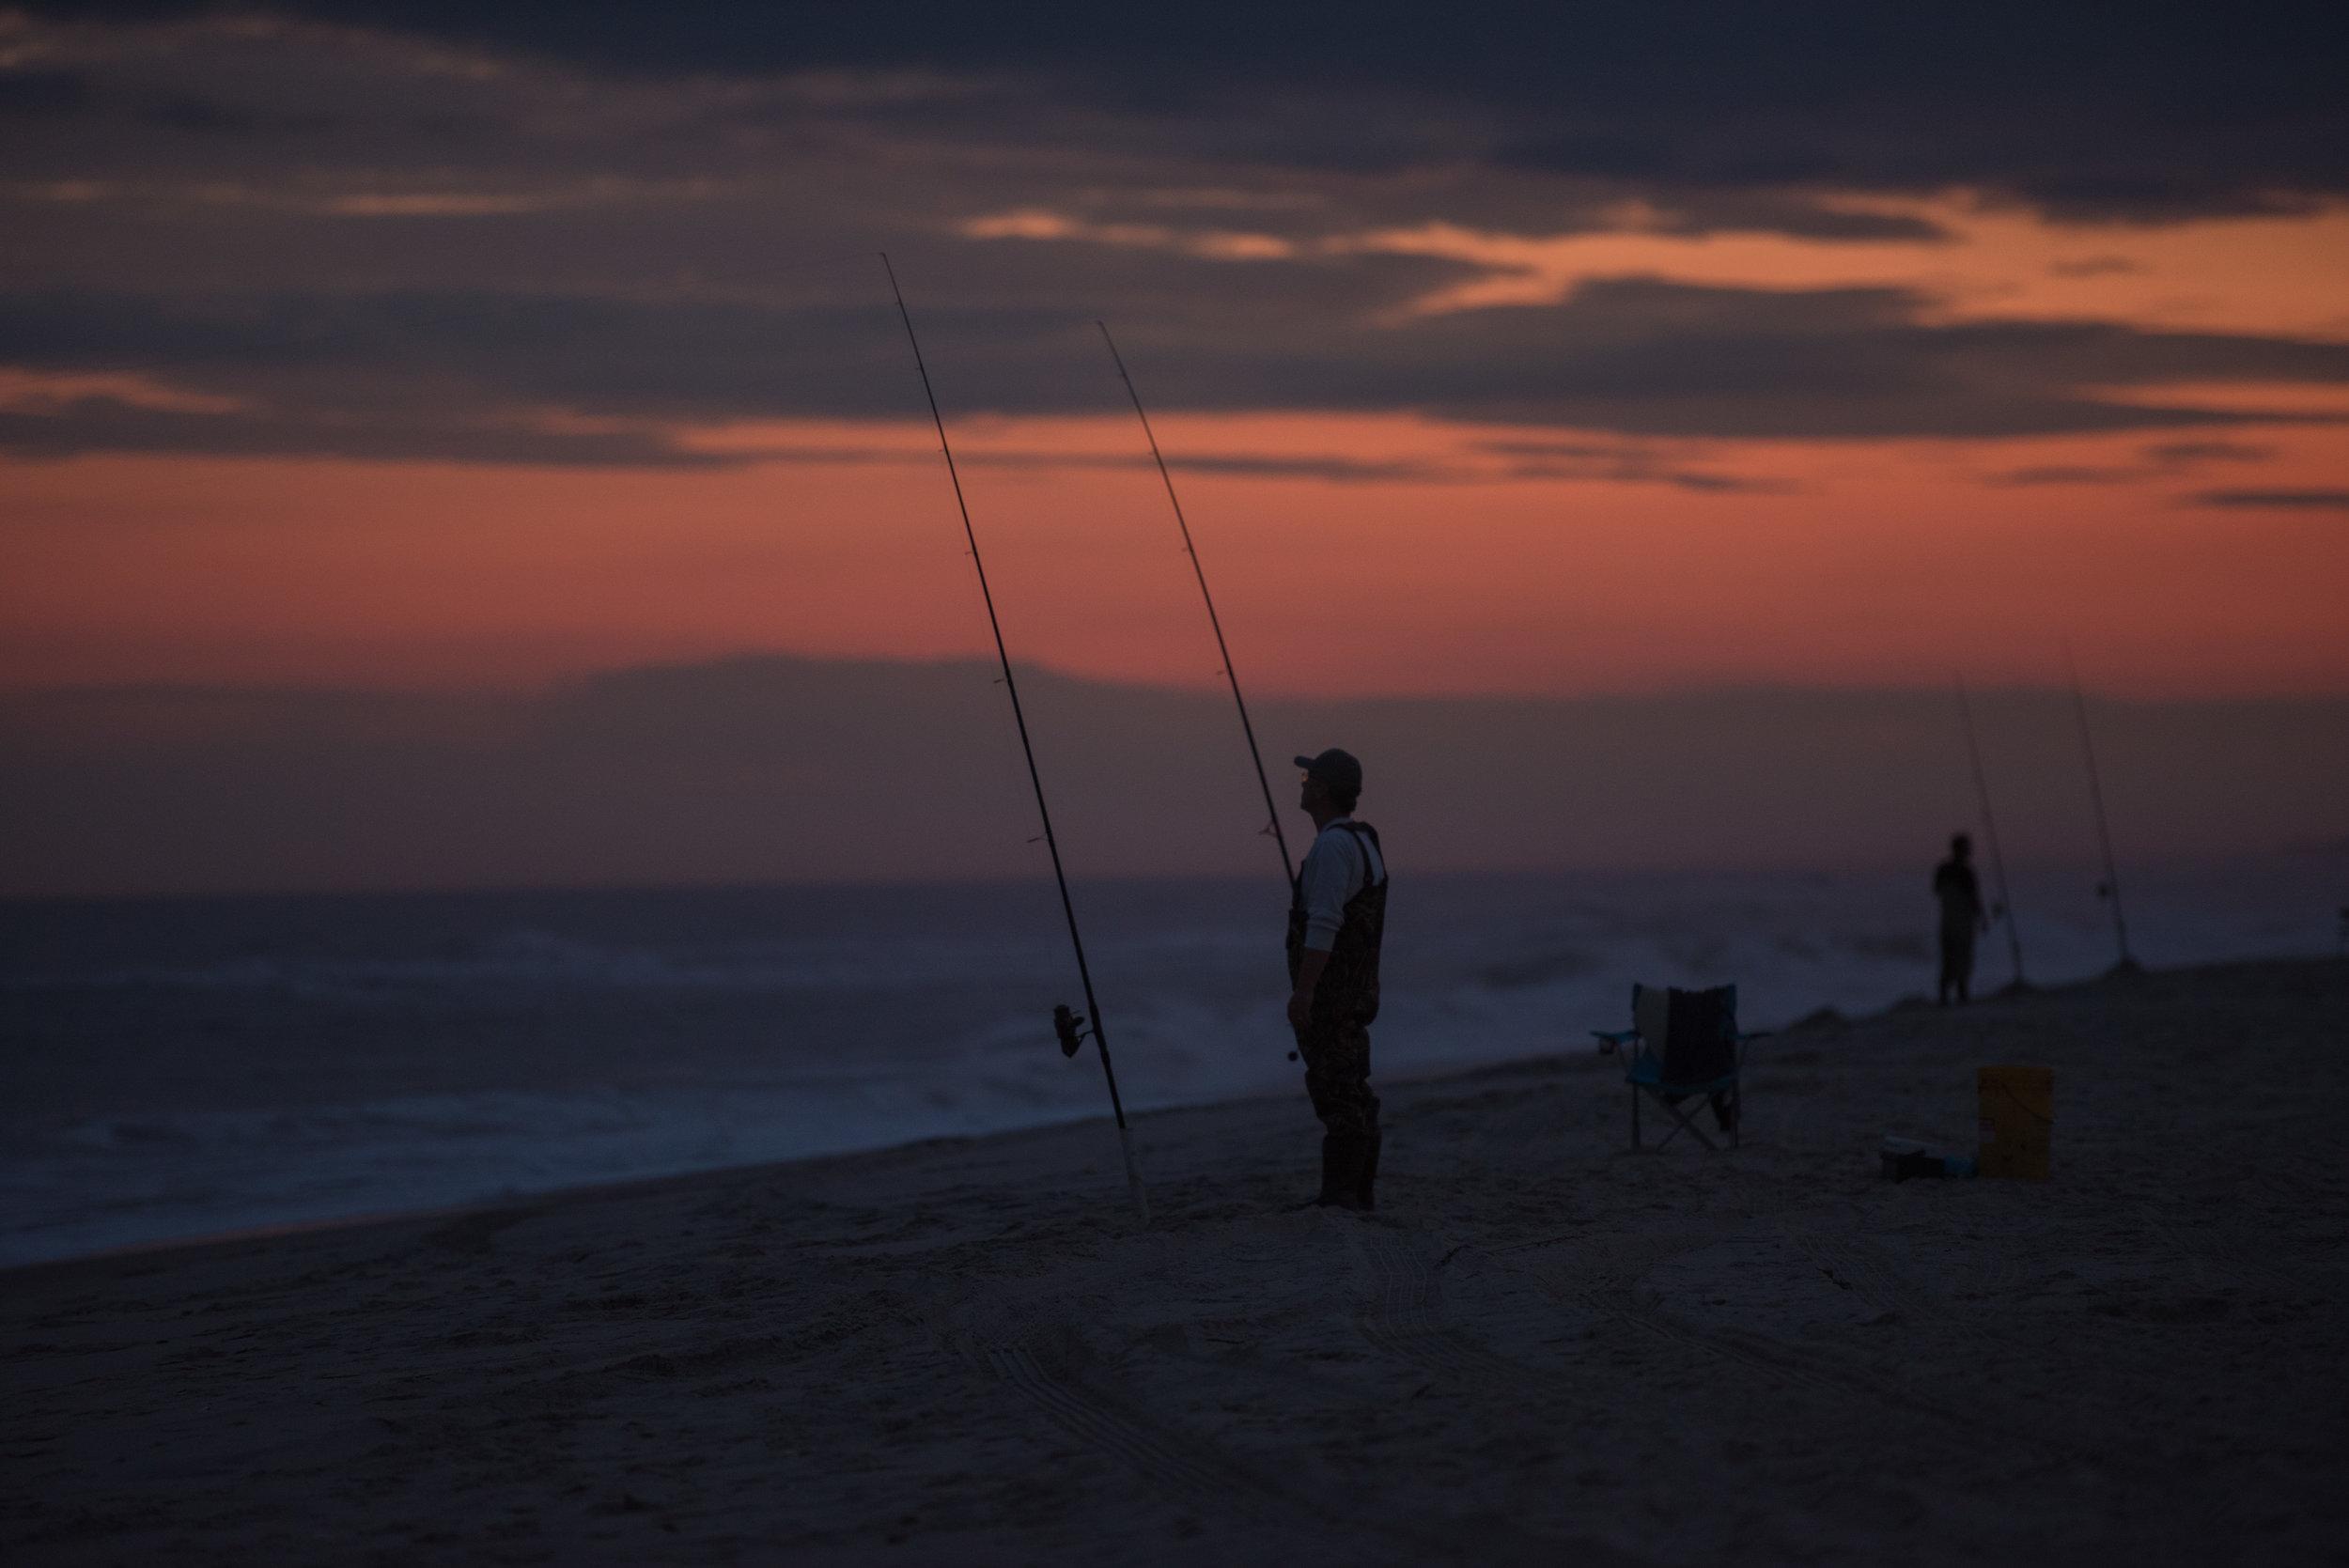 Surf Fishing LBI, NJ - Long Beach Island Offers 18 Miles Of Surf Fishing PARADISE